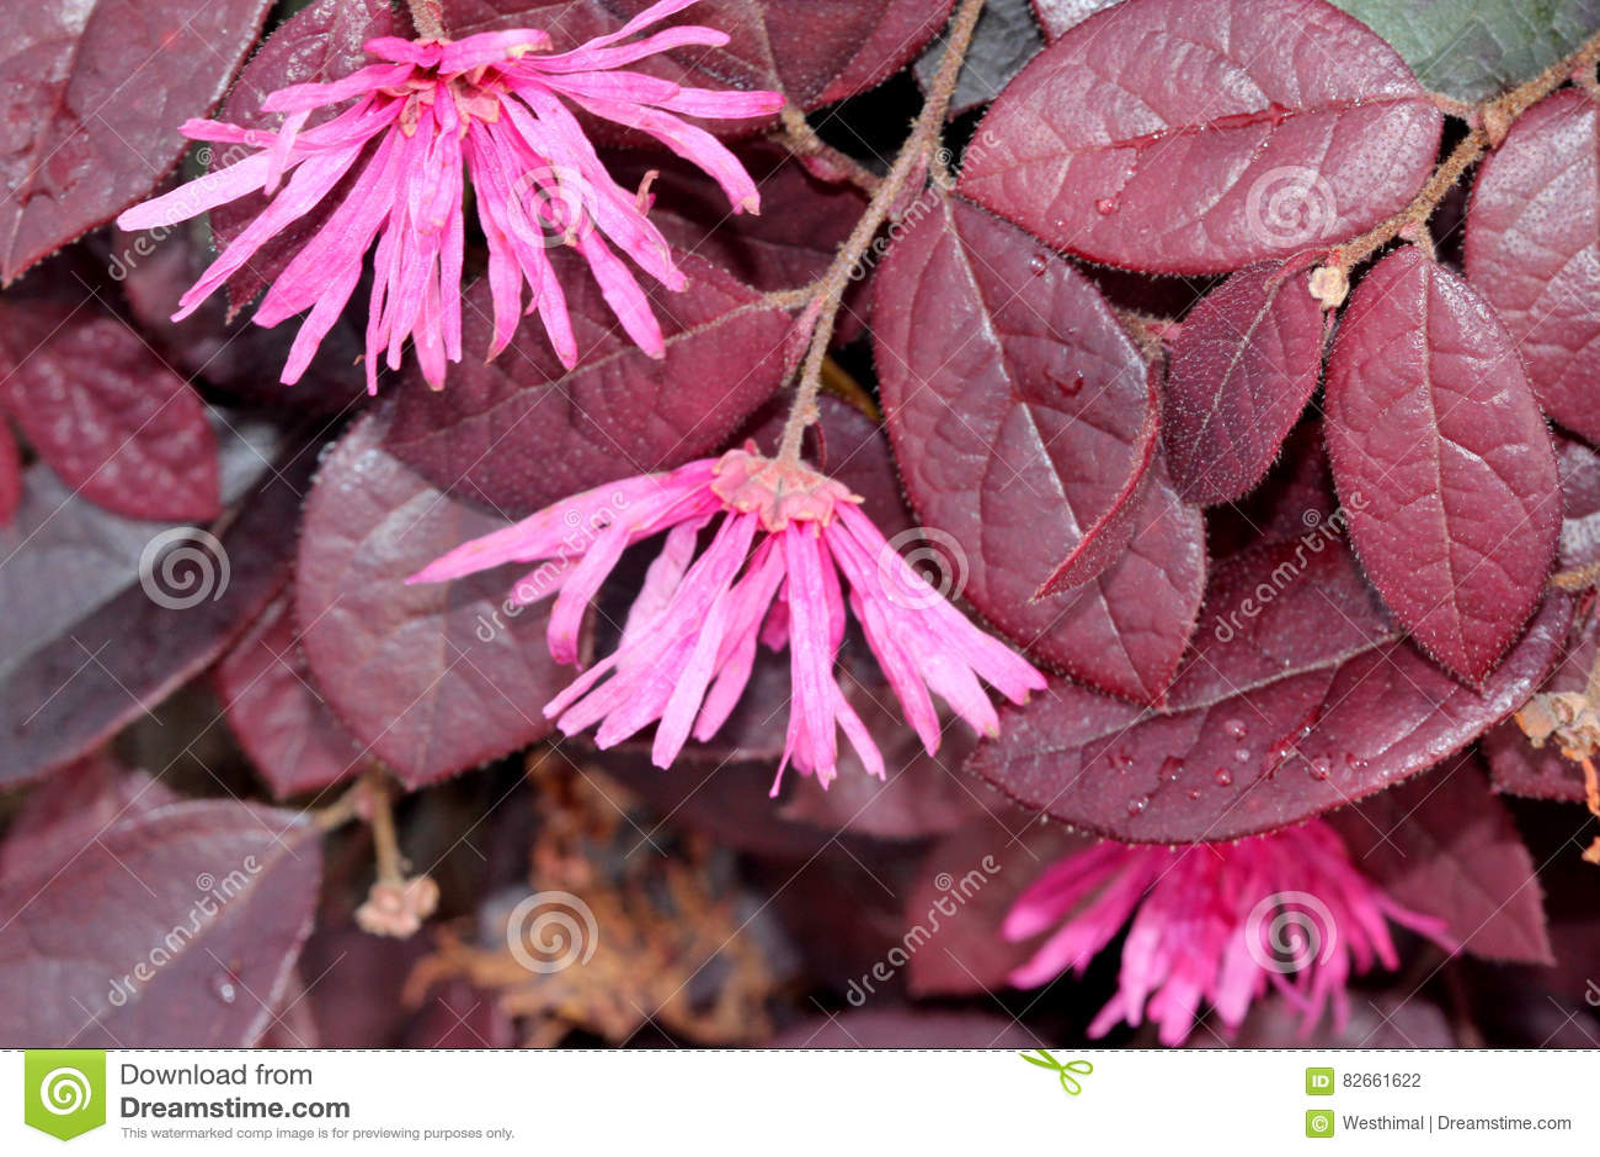 Loropetalum chinense rubrum chinese pink pink chinese fringe loropetalum chinense rubrum chinese pink pink chinese fringe flower mightylinksfo